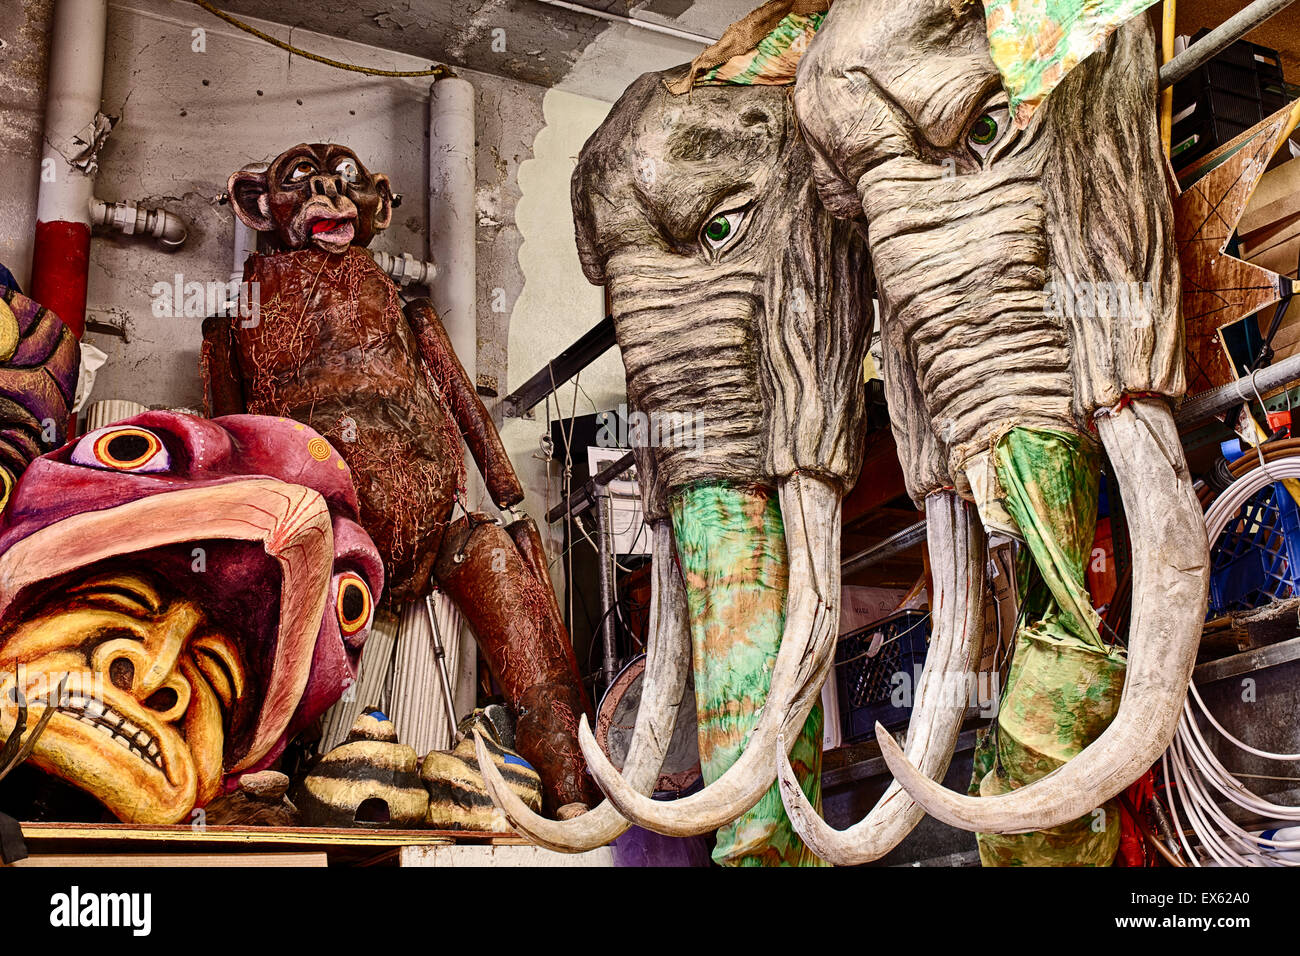 Man With Monkey Mask Stockfotos & Man With Monkey Mask Bilder - Alamy